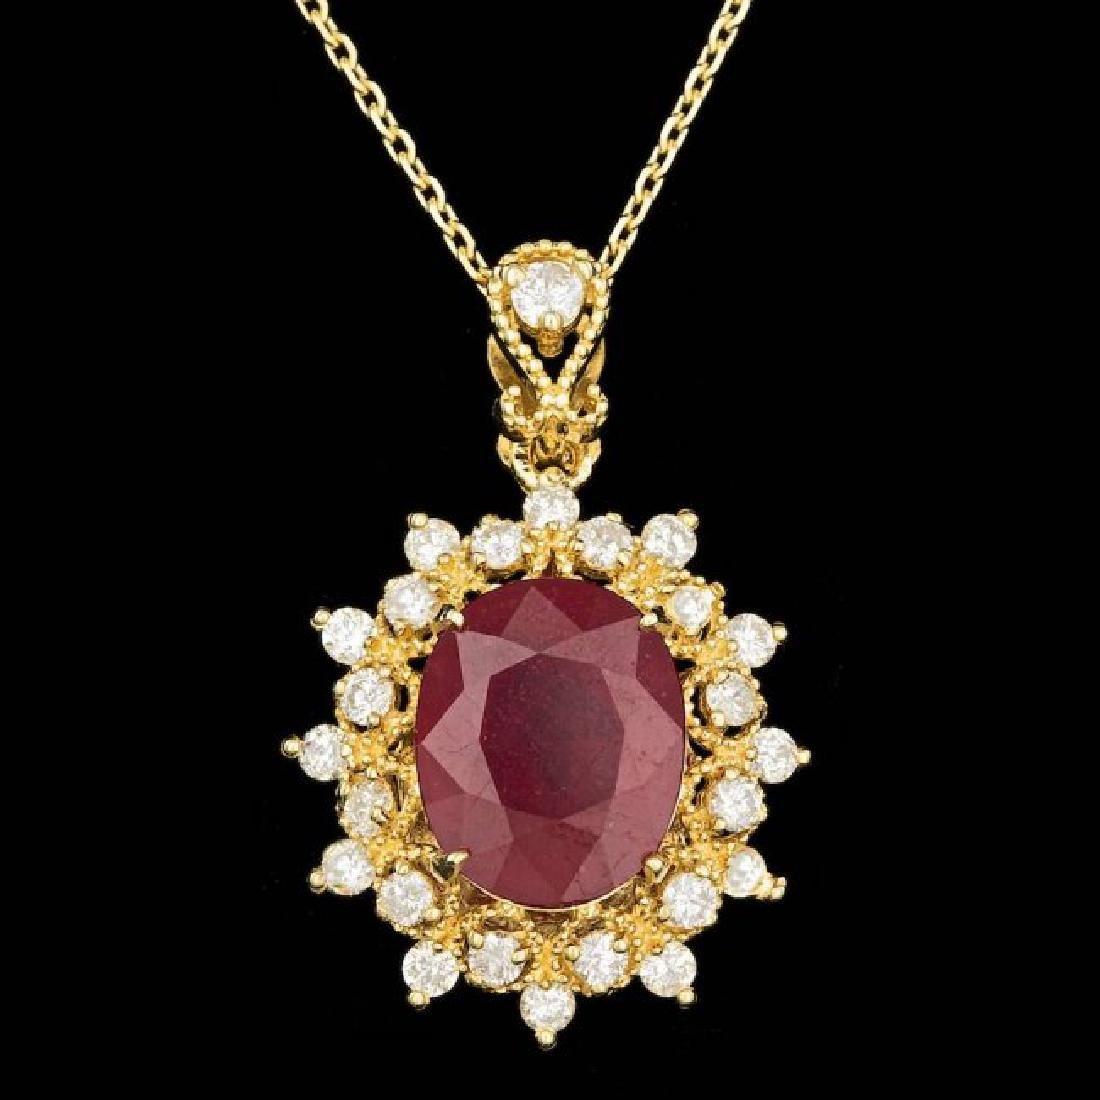 14k Gold 5.50ct Ruby 0.75ct Diamond Pendant